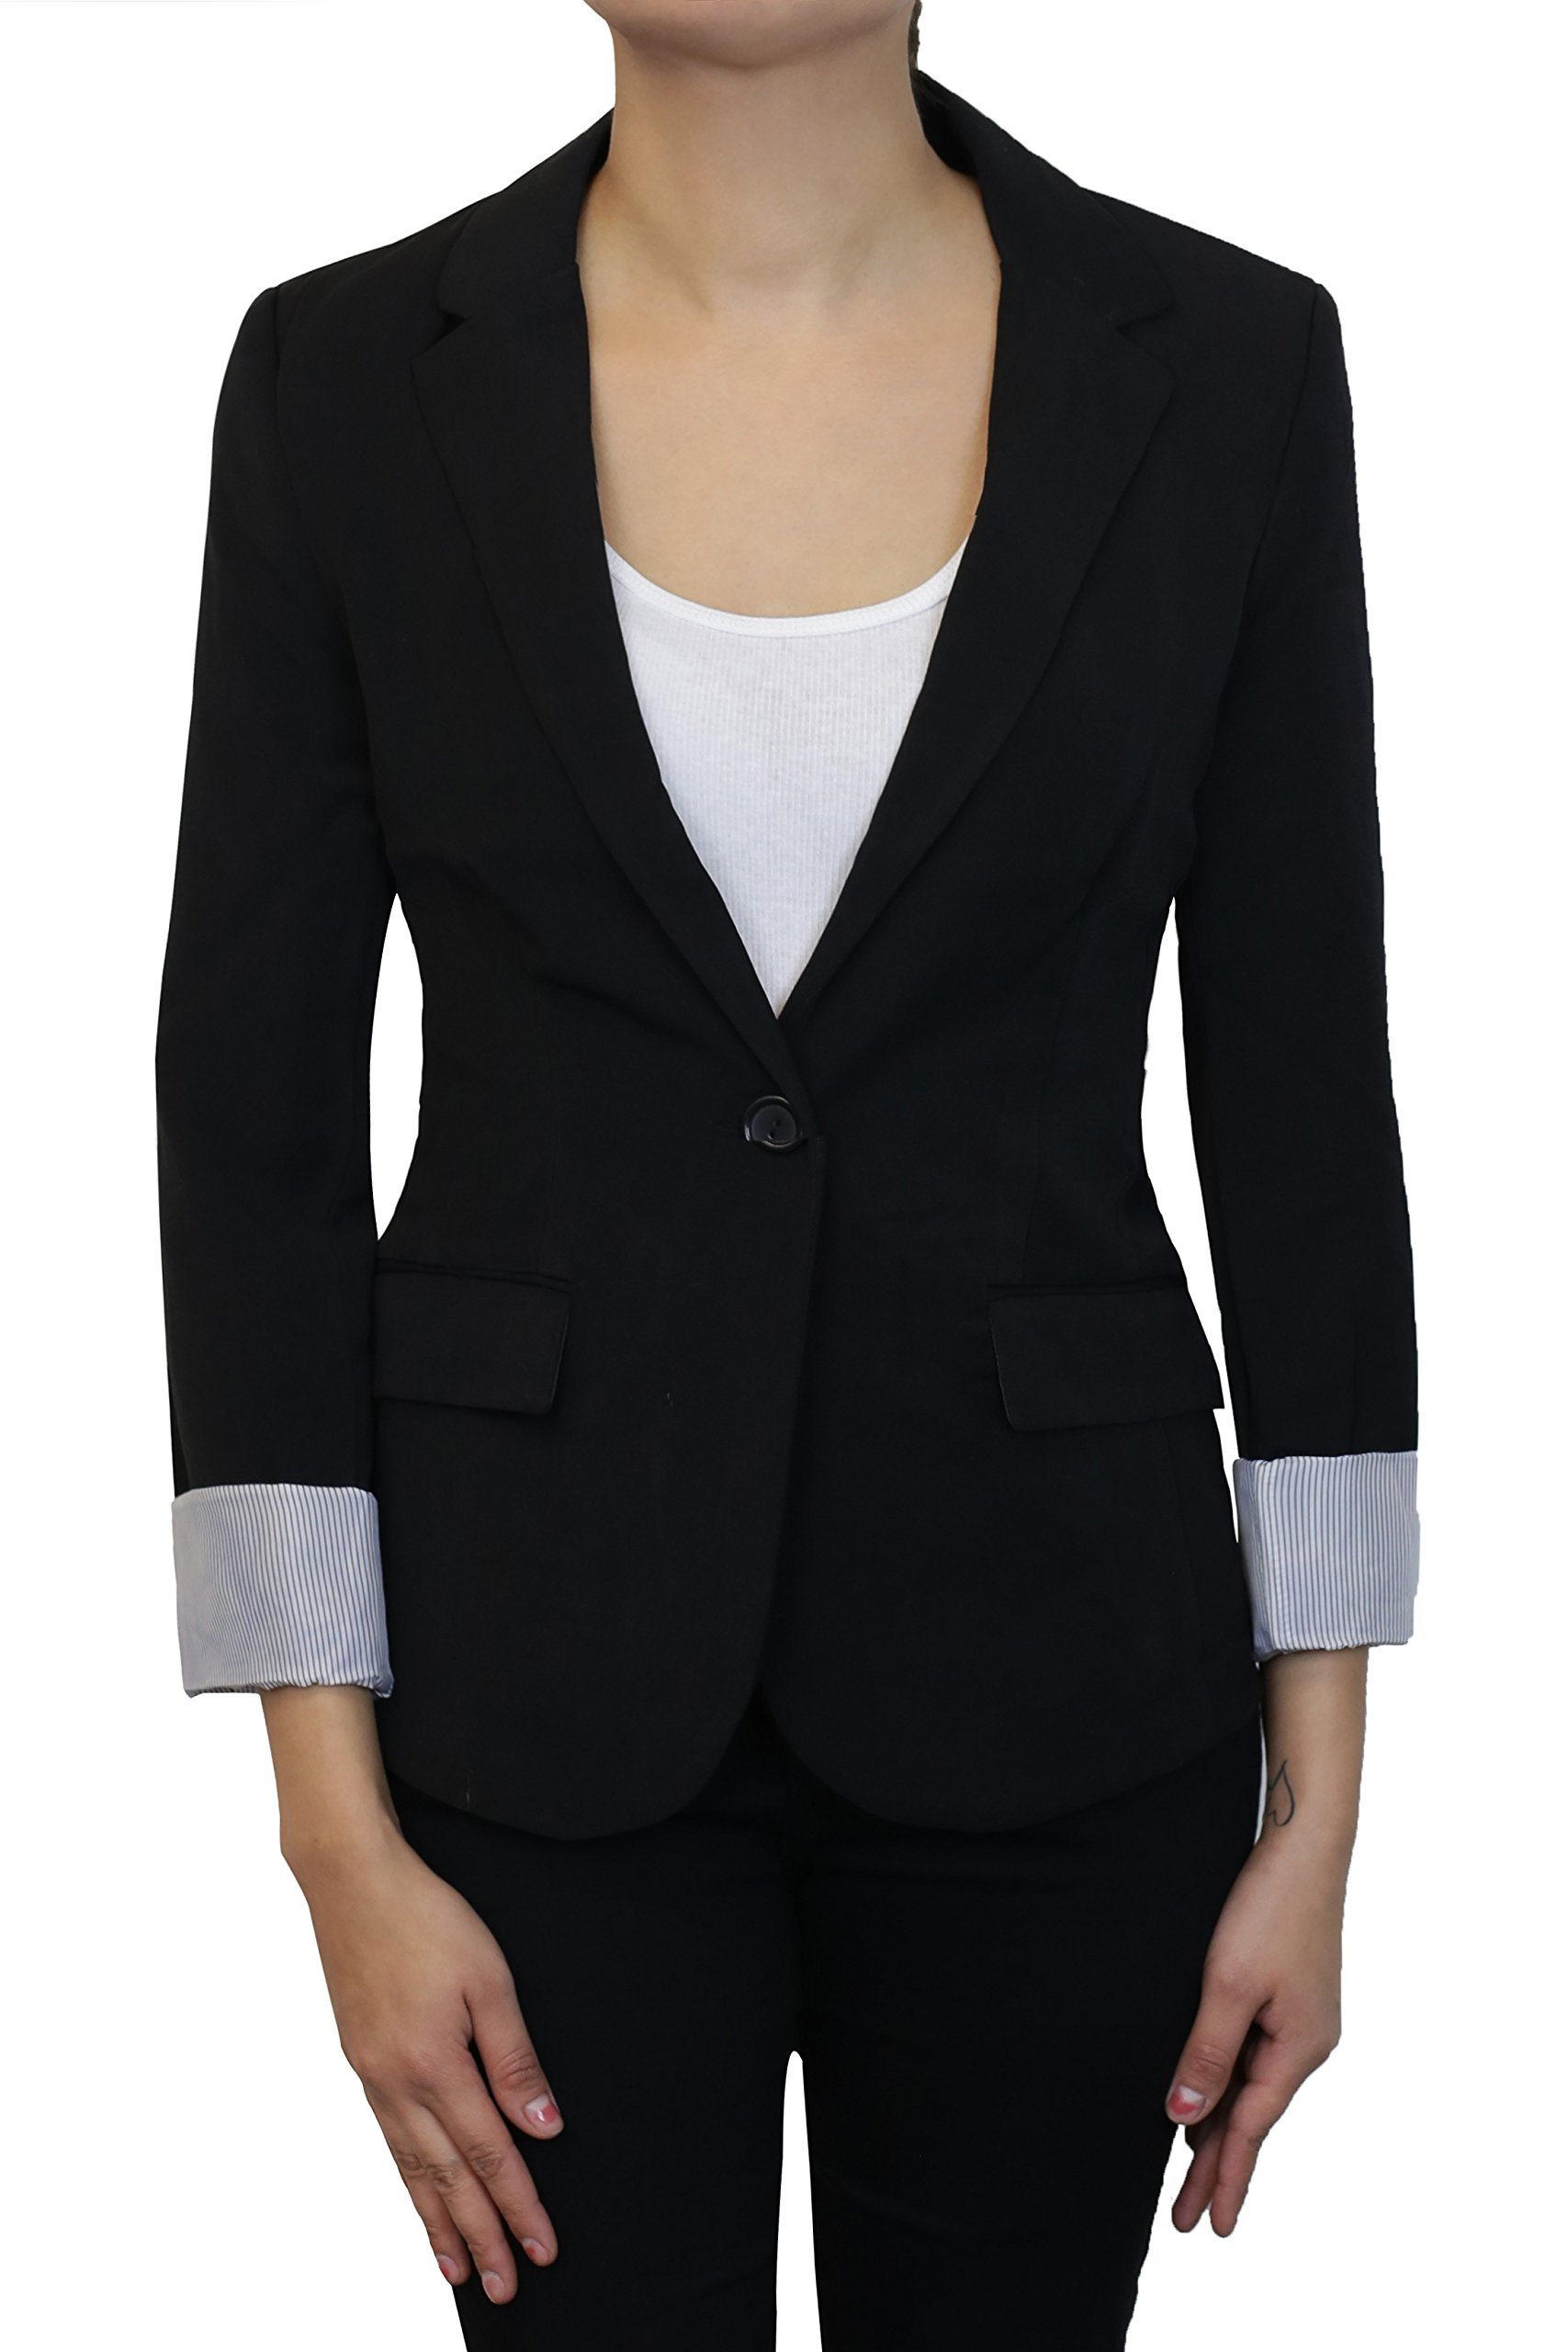 Instar Mode Women's Versatile Business Attire Blazers in Varies Styles (B22117 Black, Small)